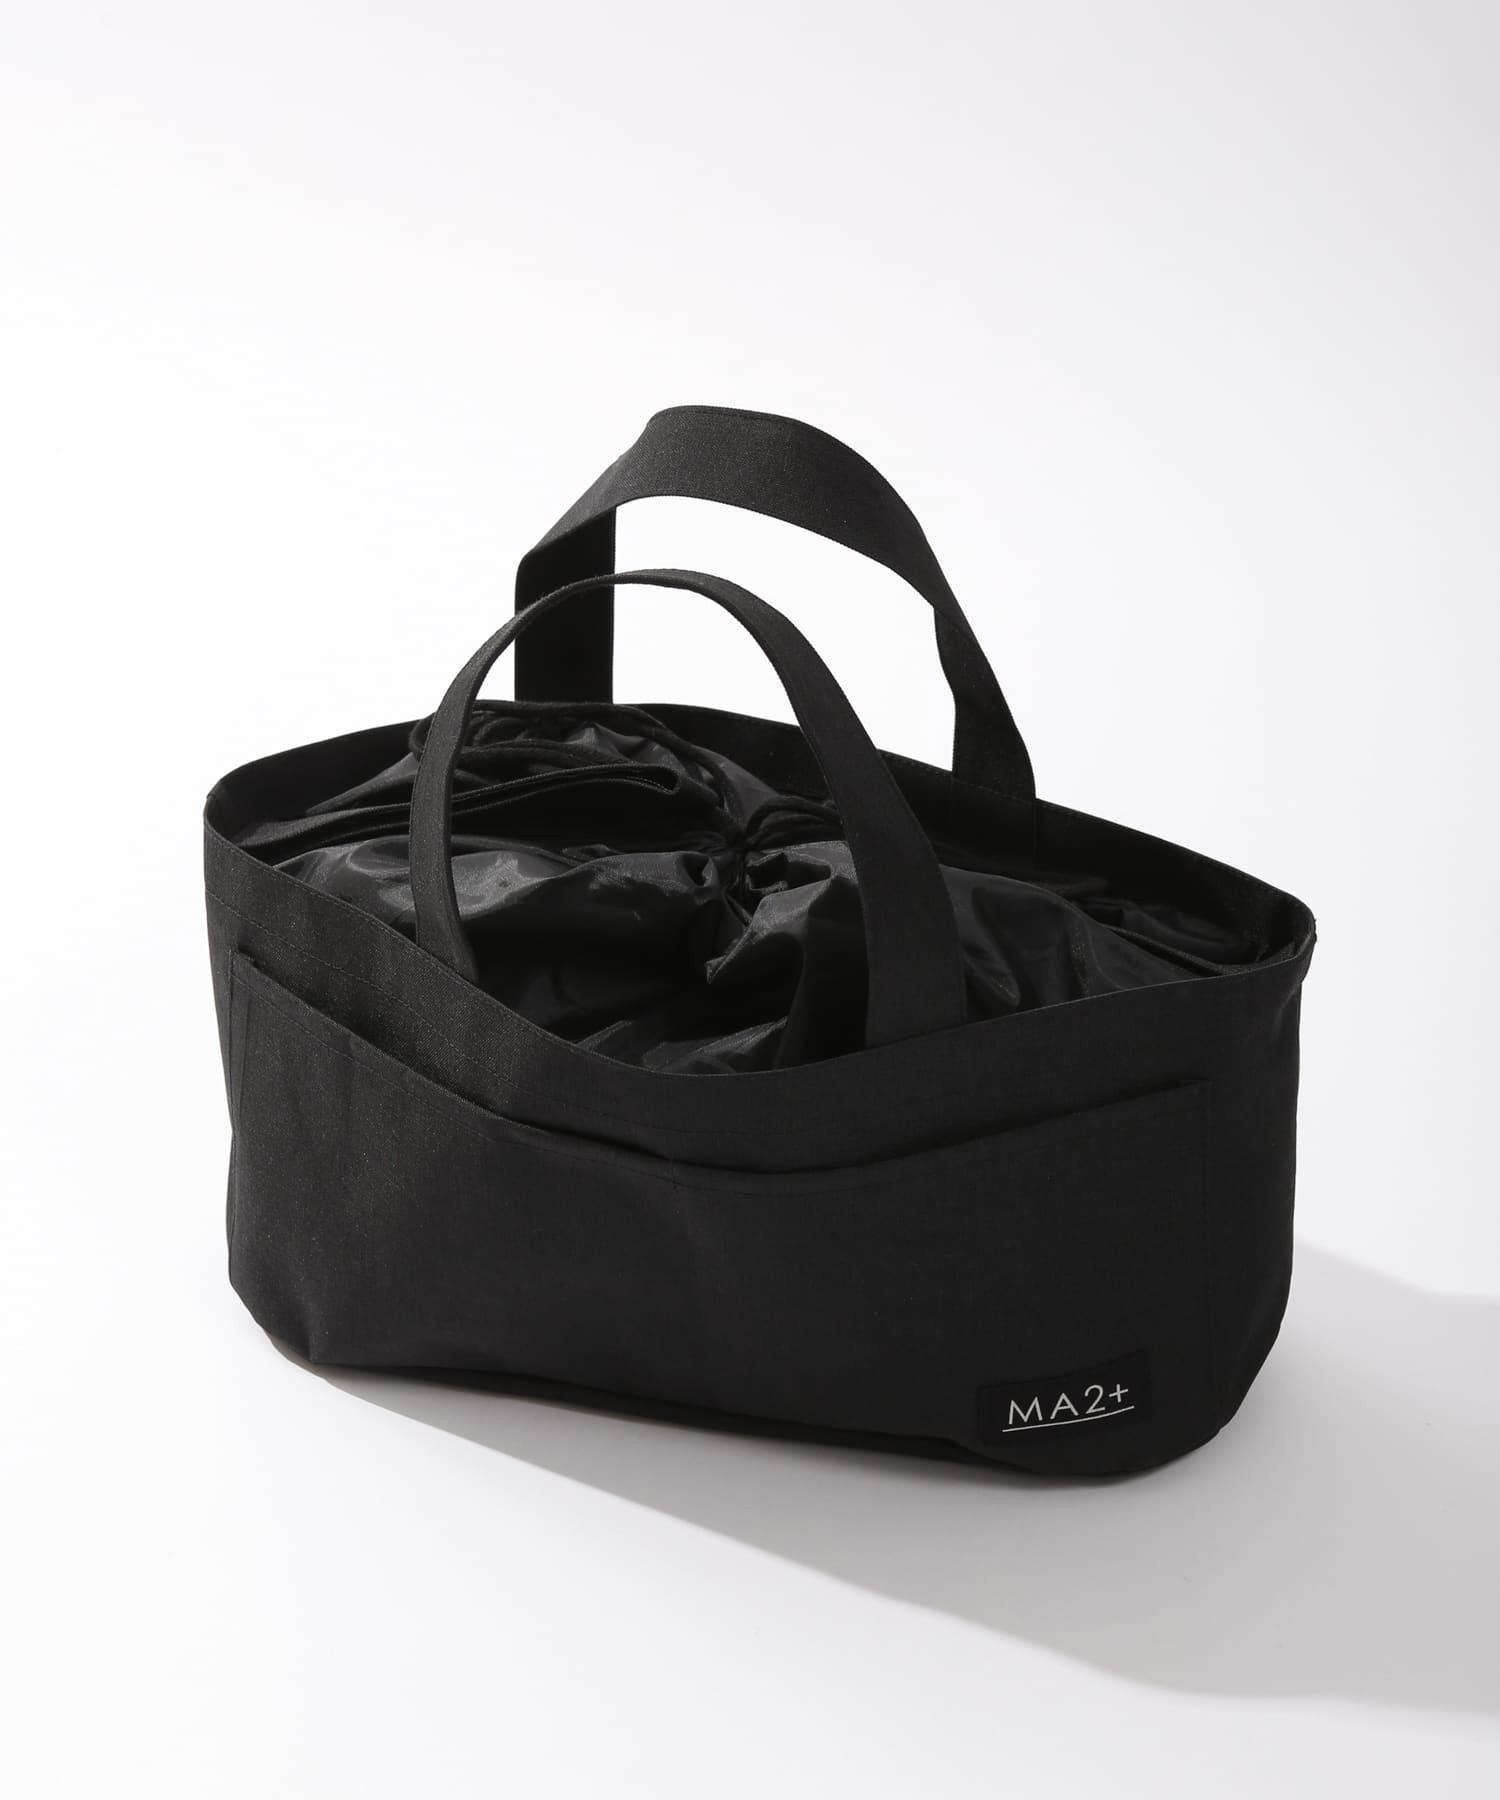 3COINS(スリーコインズ) 【子育て便利グッズ】ベビーカーバッグ